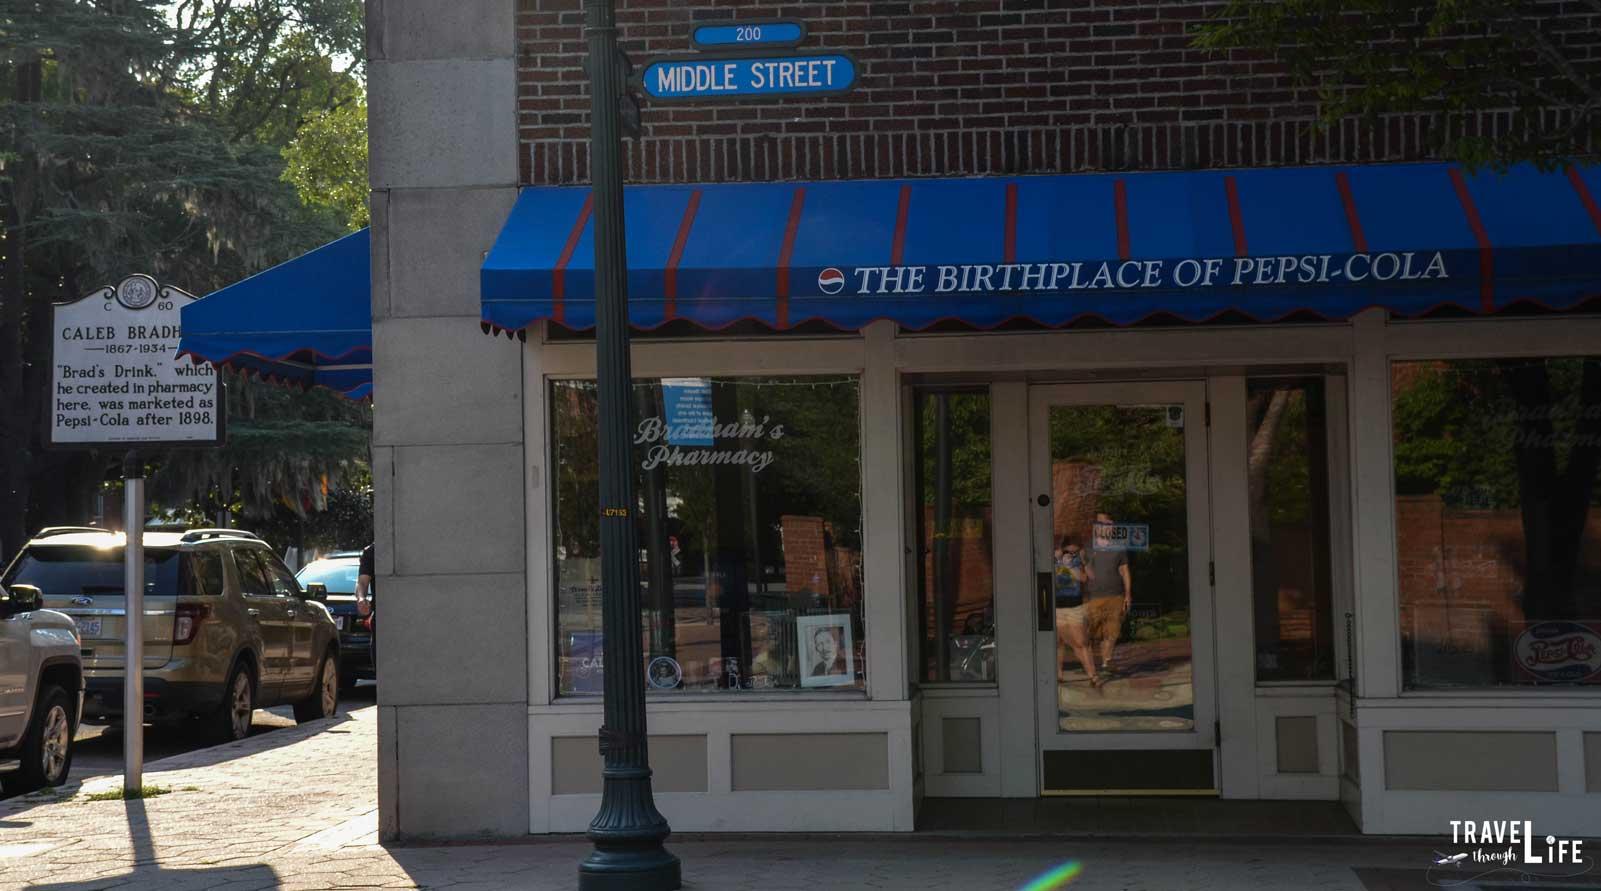 New Bern North Carolina Birthplace of Pepsi